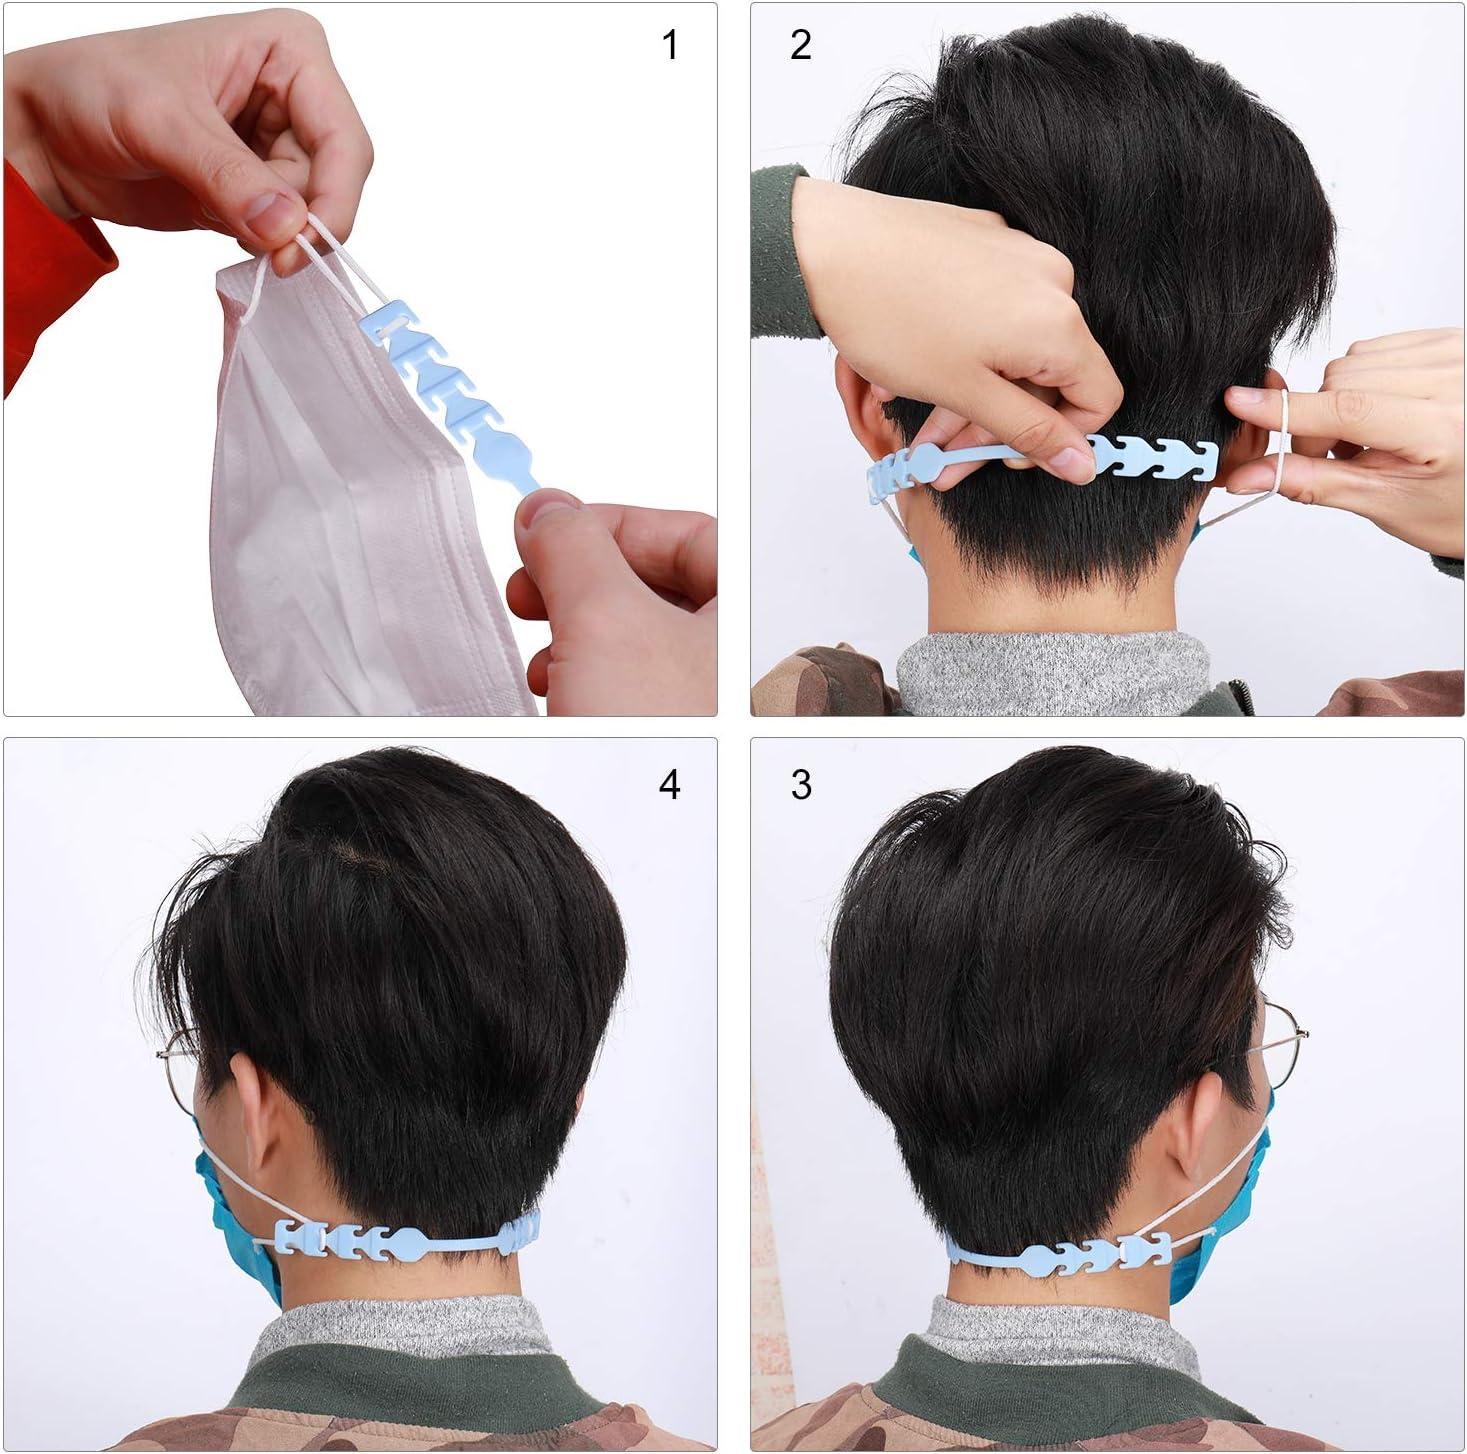 Adjustable Mask Ear Saver Strap Anti-Slip Ear Protection Buckle for Masks to Relieve Masks Pressure and Pain for Men,Women Child Black JISONCASE 5pcs Mask Extender Hook